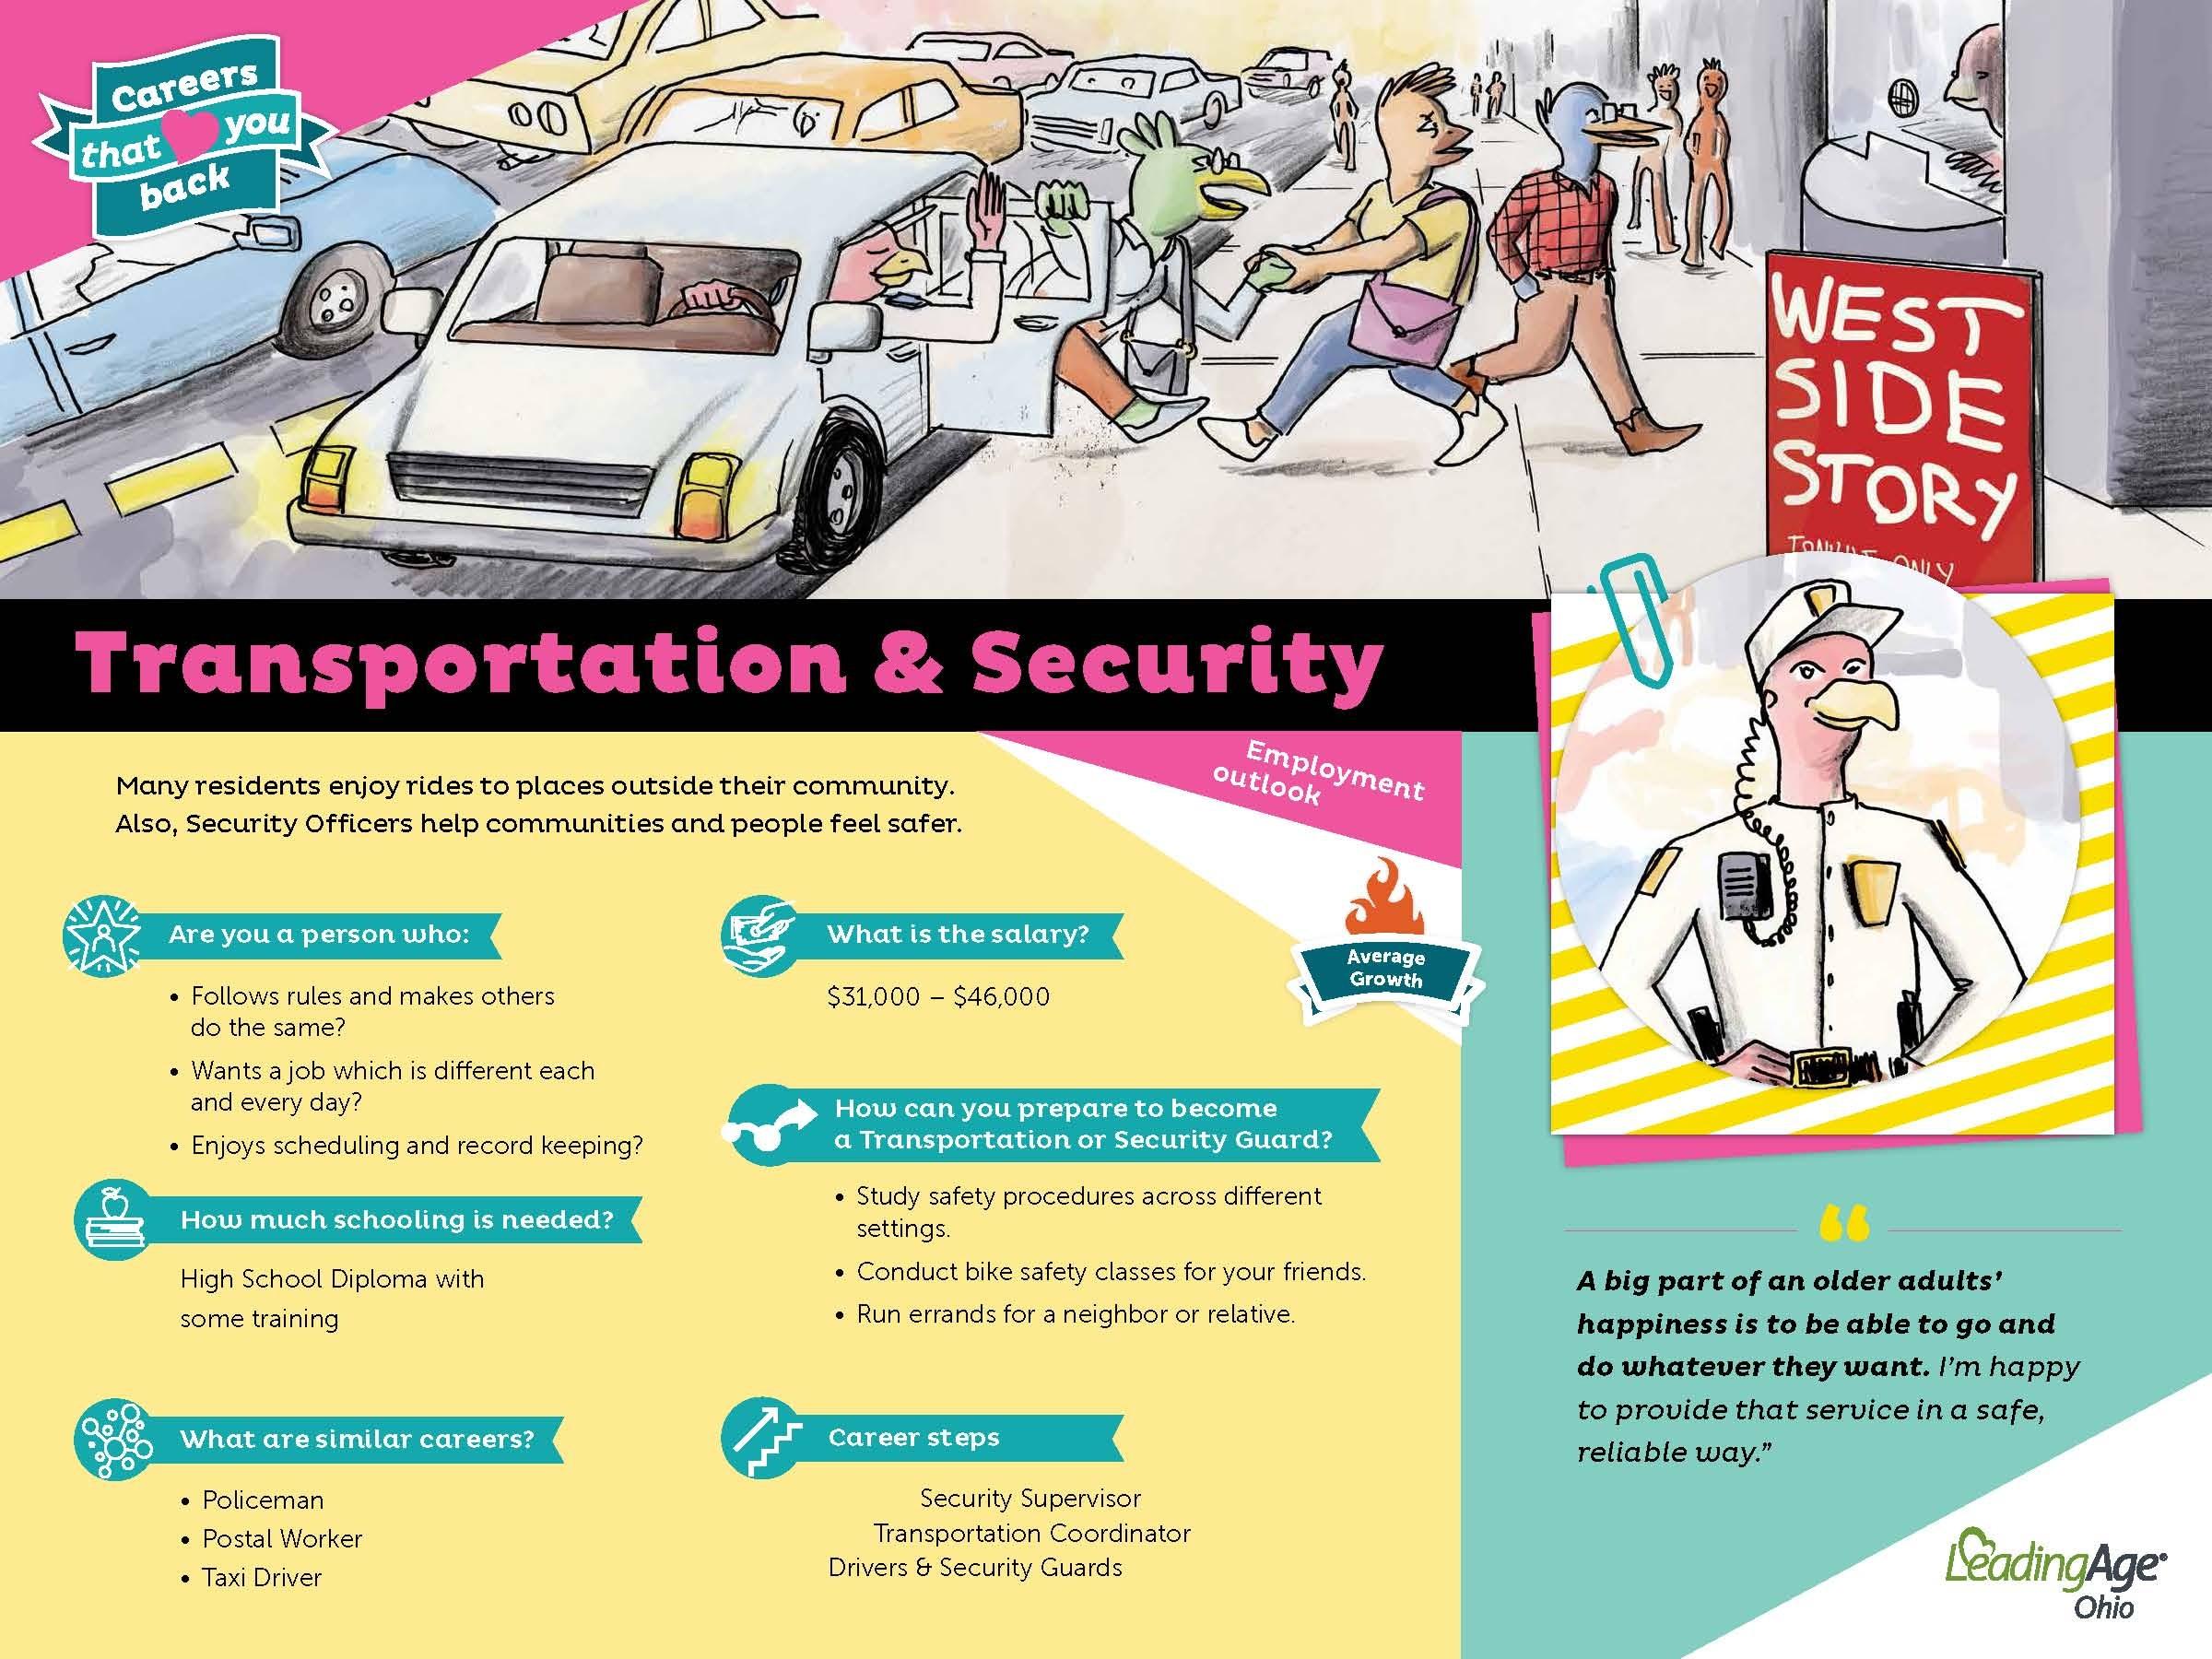 Transportation & Security